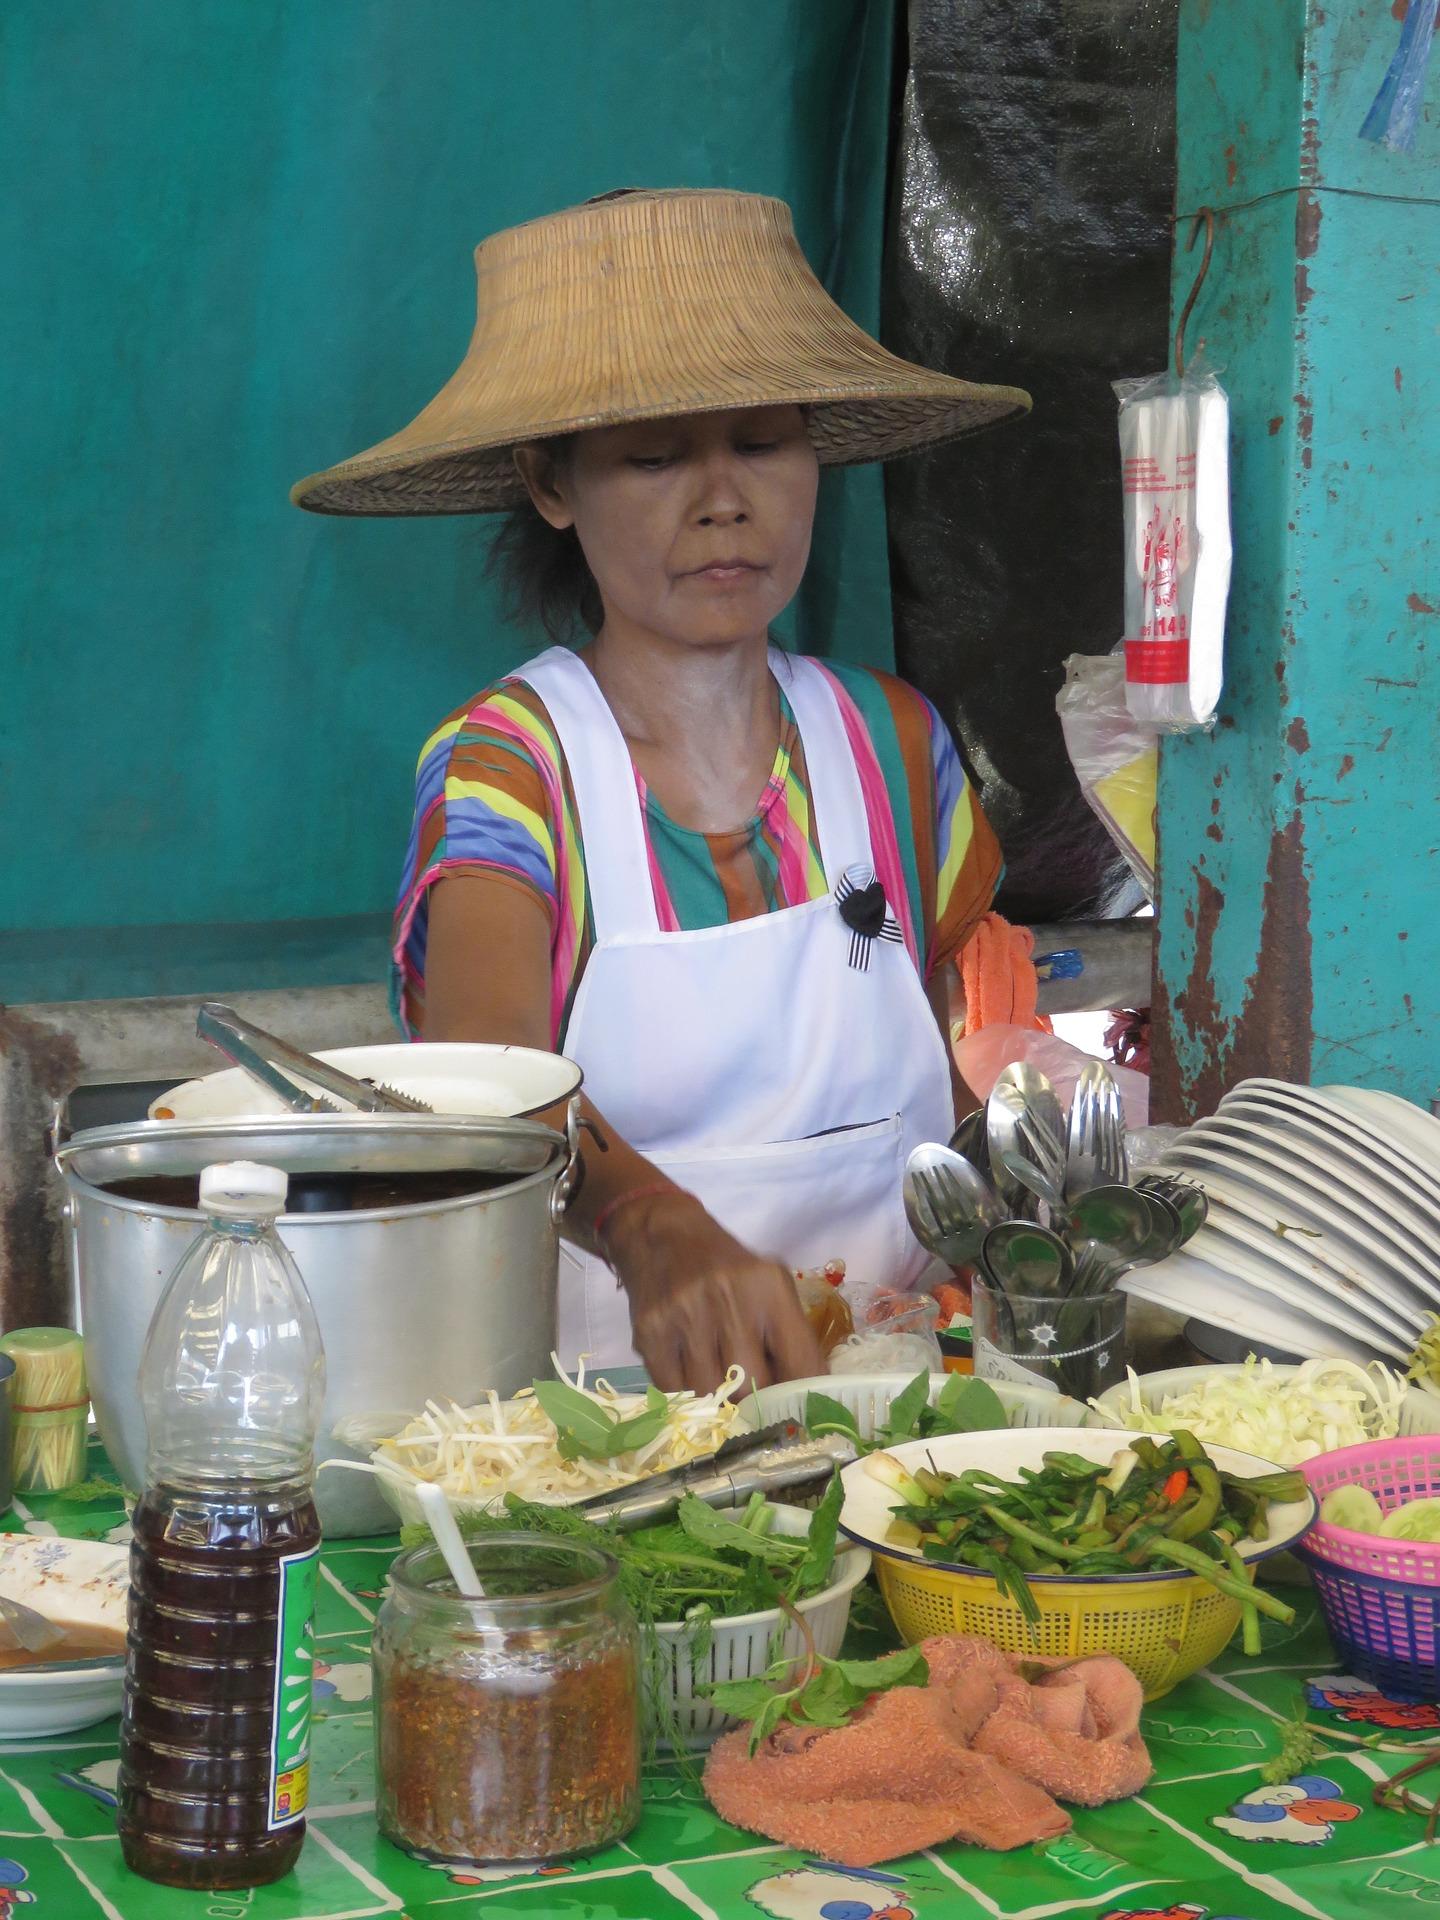 klong-toey-market-2259774_1920